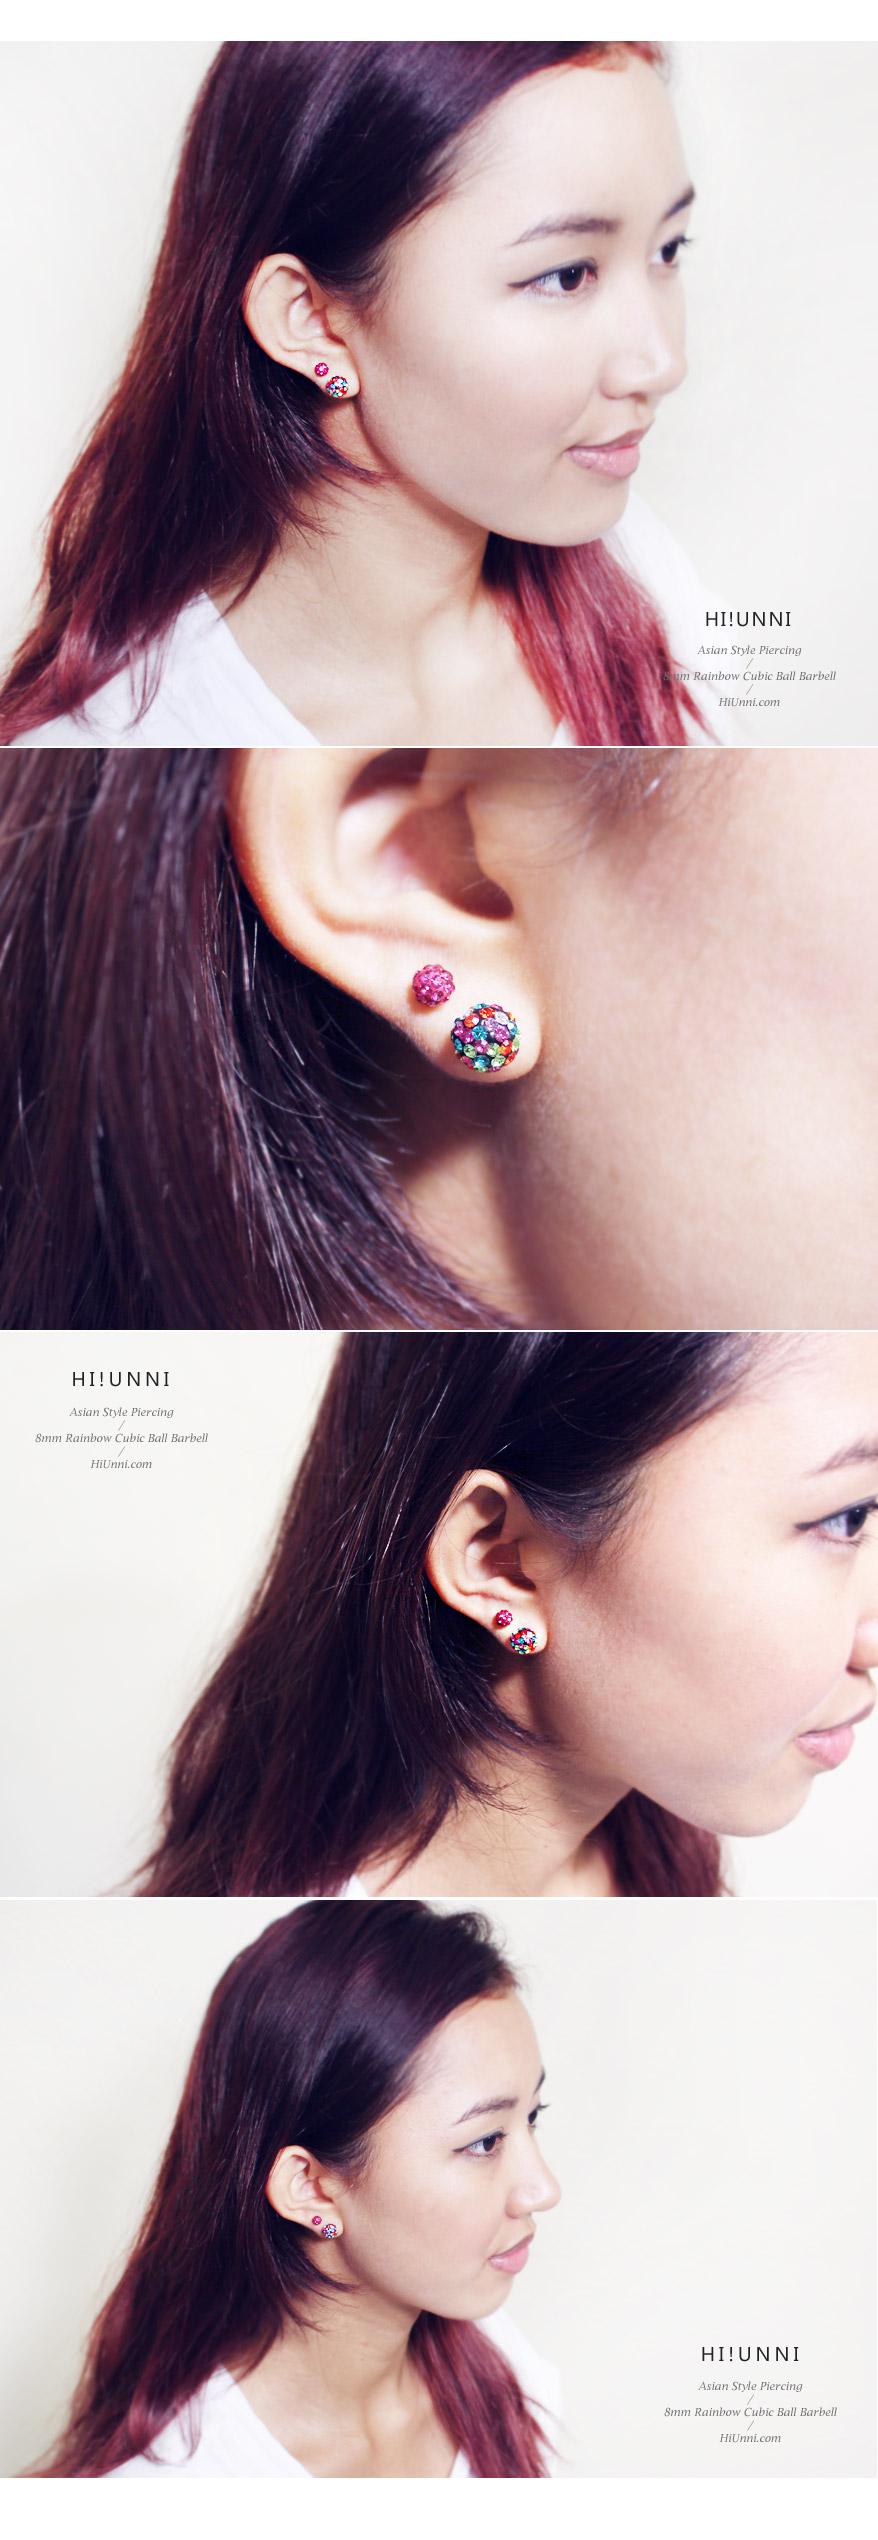 8mm_ear_studs_piercing_Cartilage_korean_asian_style_cubicball_barbell_Rainbow_4